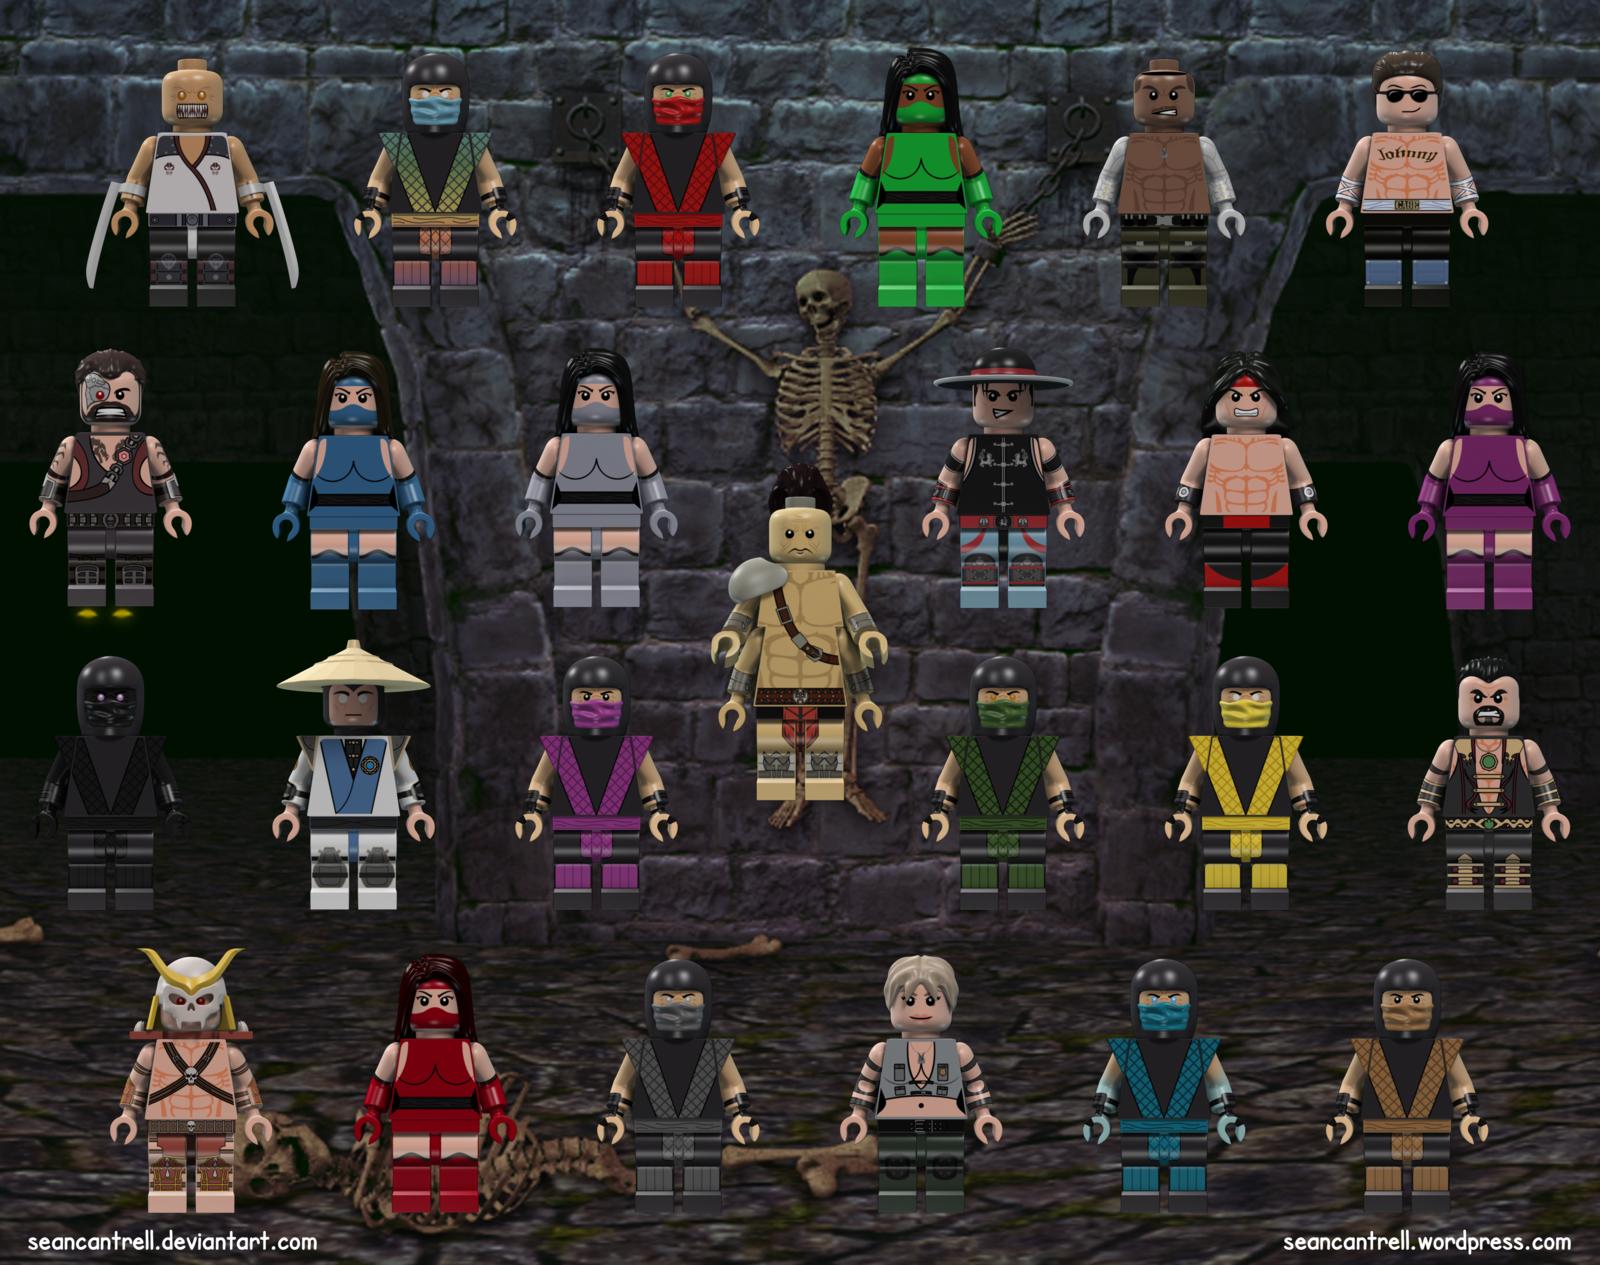 Lego Mortal Kombat | Toys | Mortal kombat, Mortal kombat